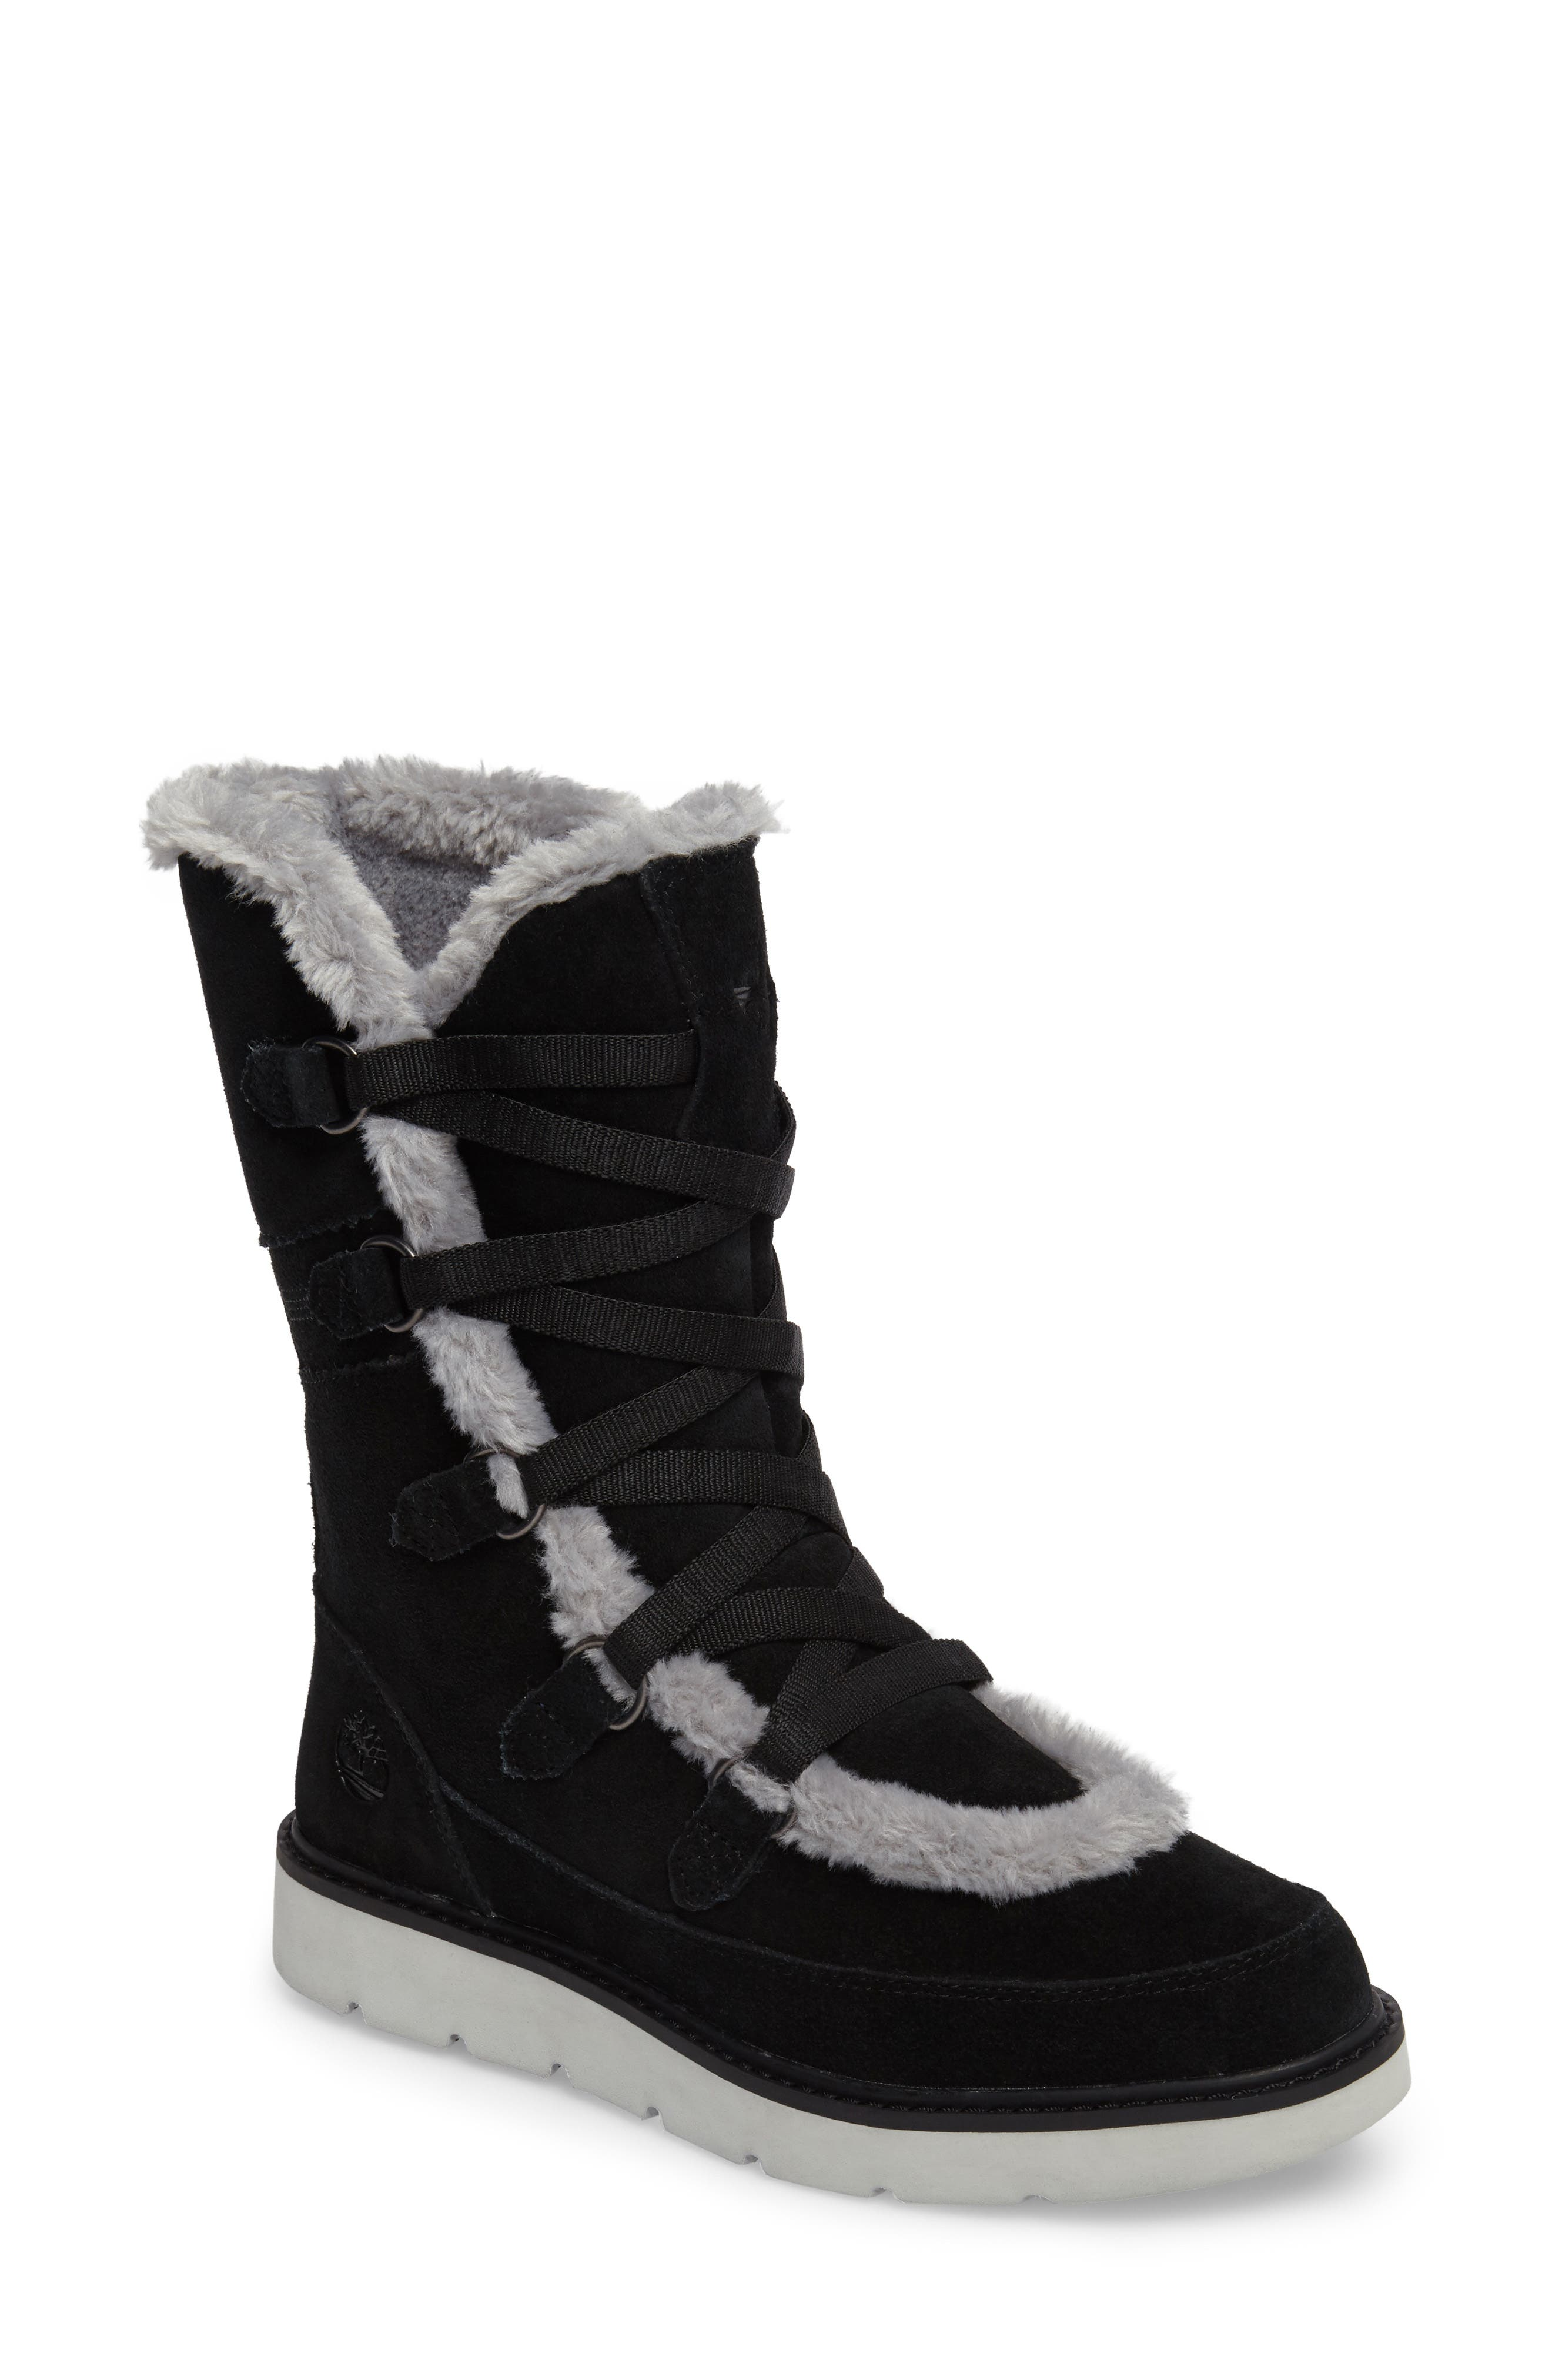 Kenniston Faux Fur Water Resistant Mukluk Boot,                             Main thumbnail 1, color,                             001